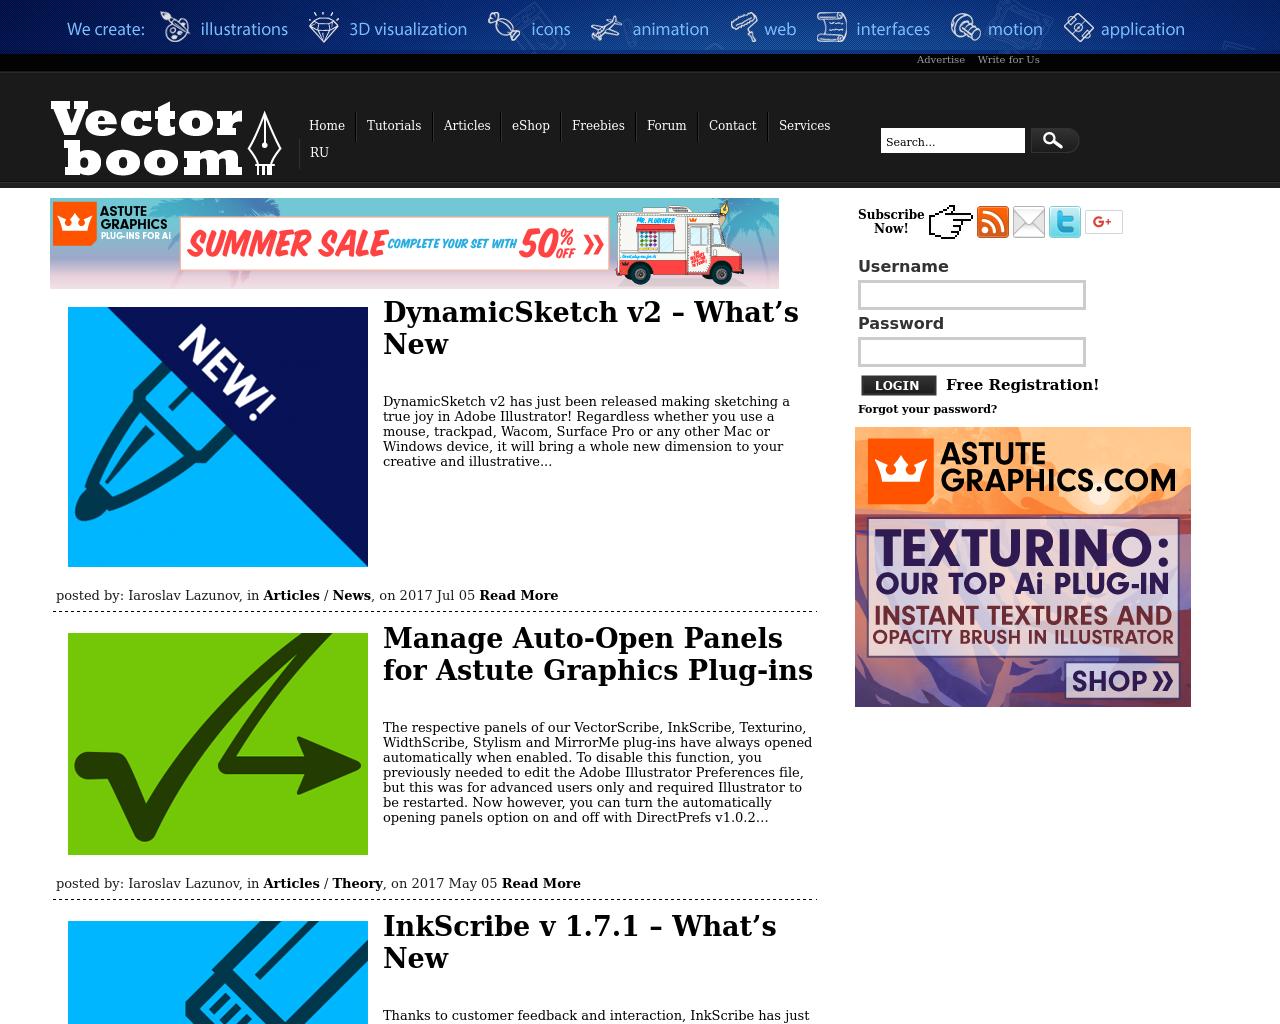 Vectorboom-Advertising-Reviews-Pricing